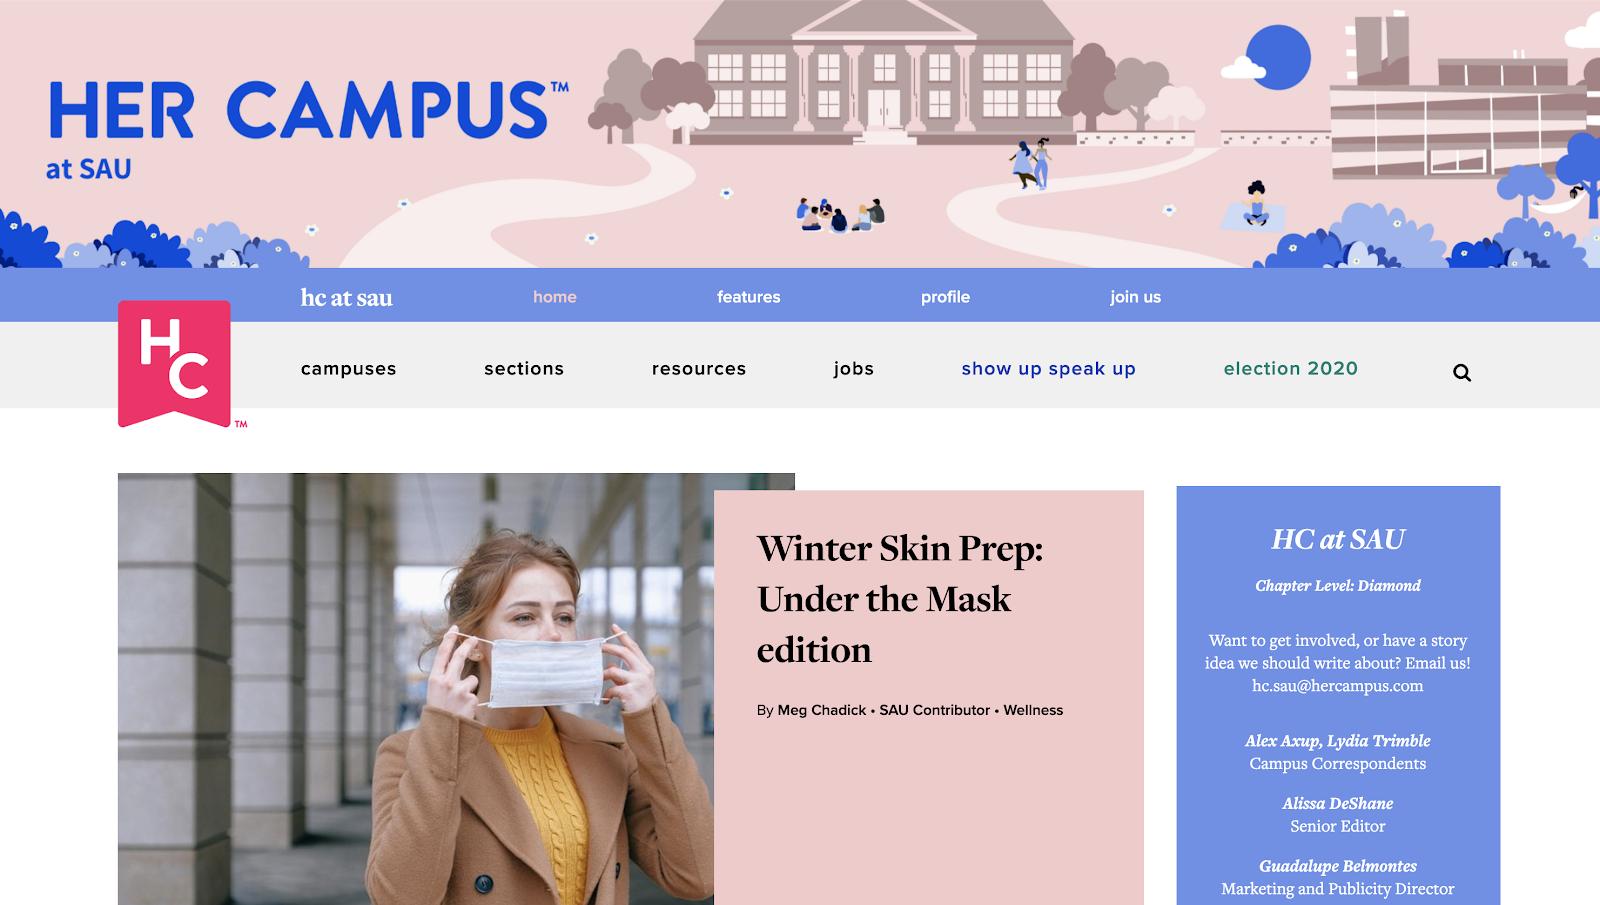 Her Campus at SAU's website.